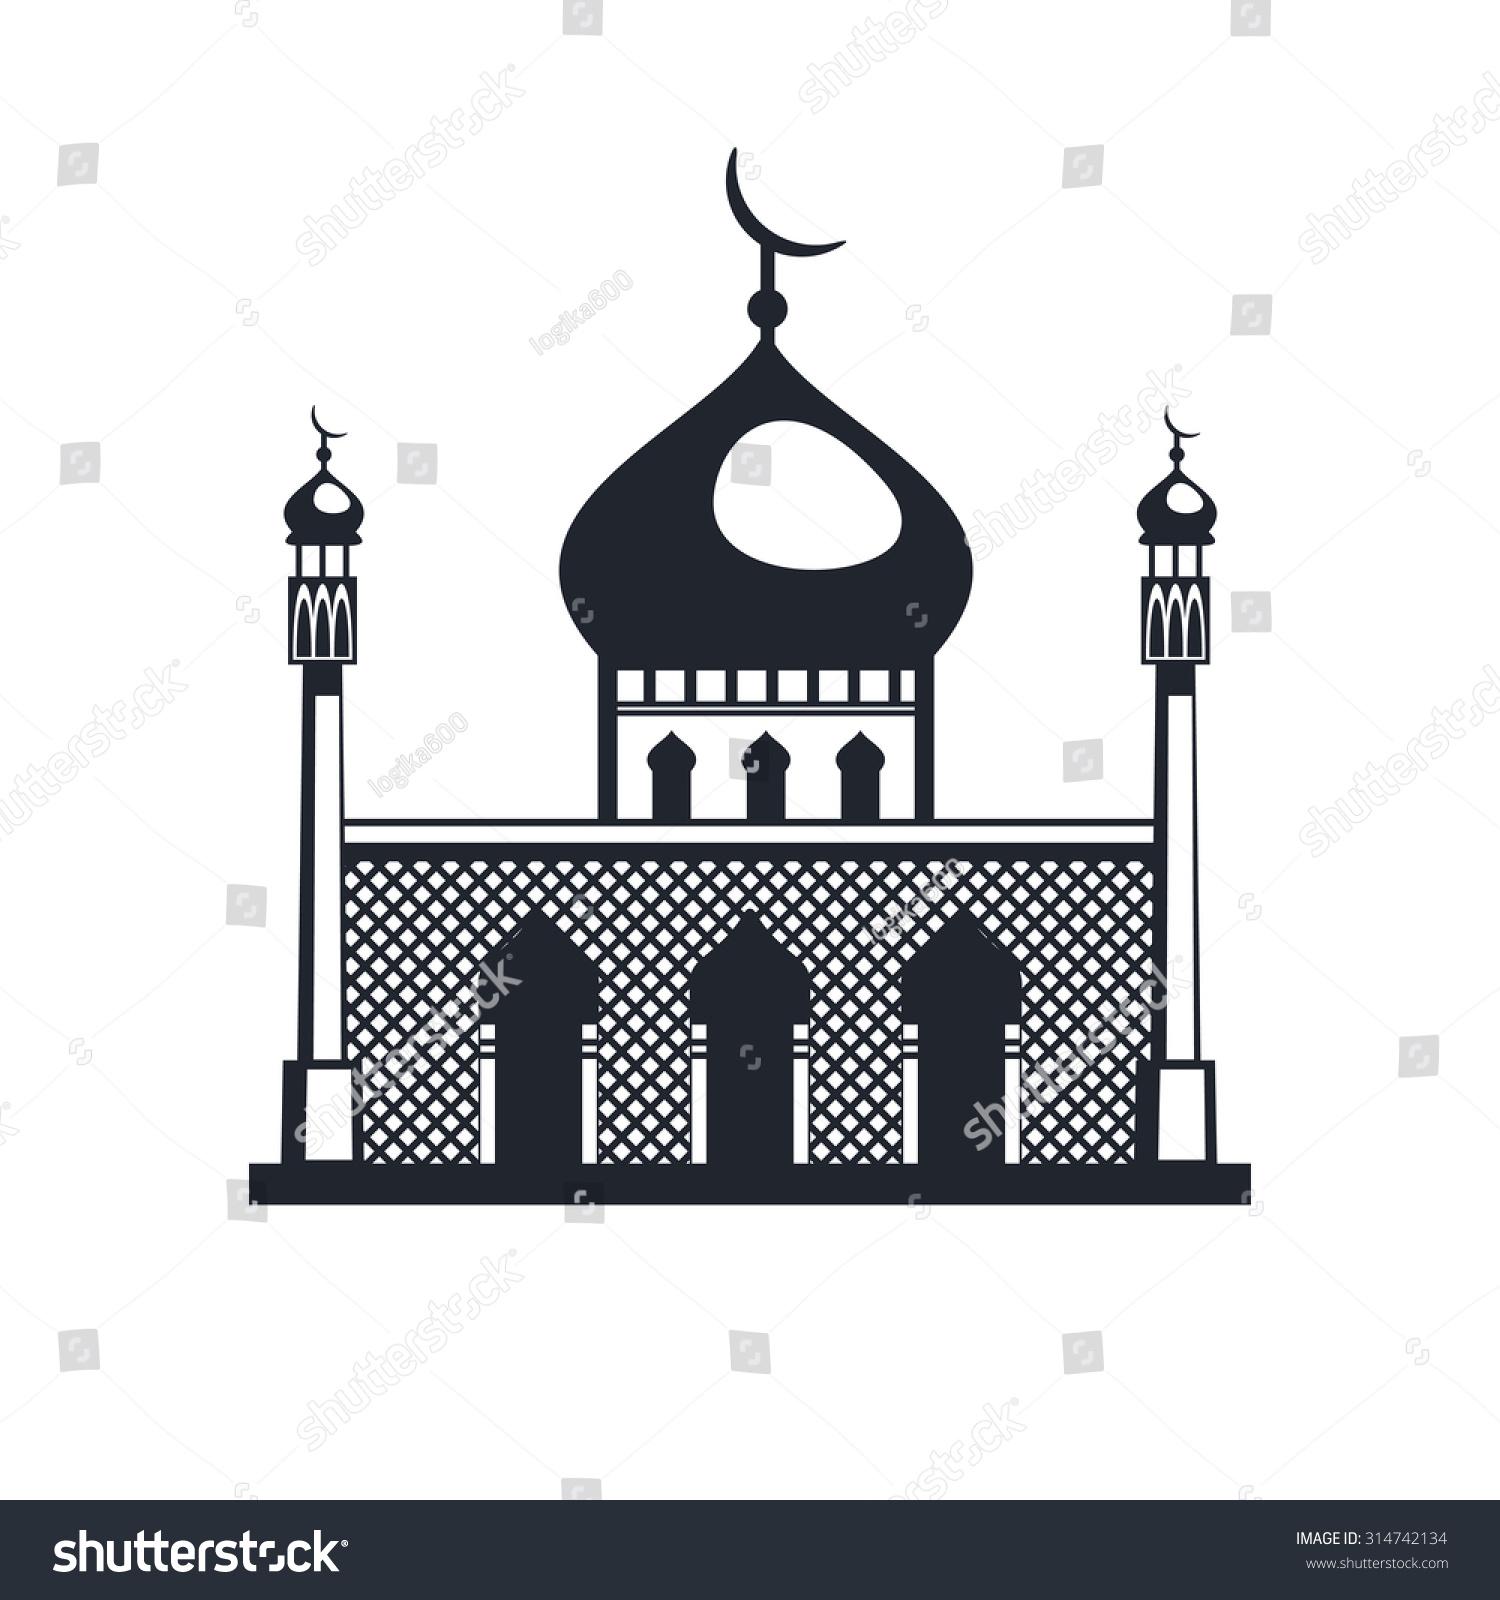 Mosque building religious symbol stock illustration 314742134 mosque building a religious symbol biocorpaavc